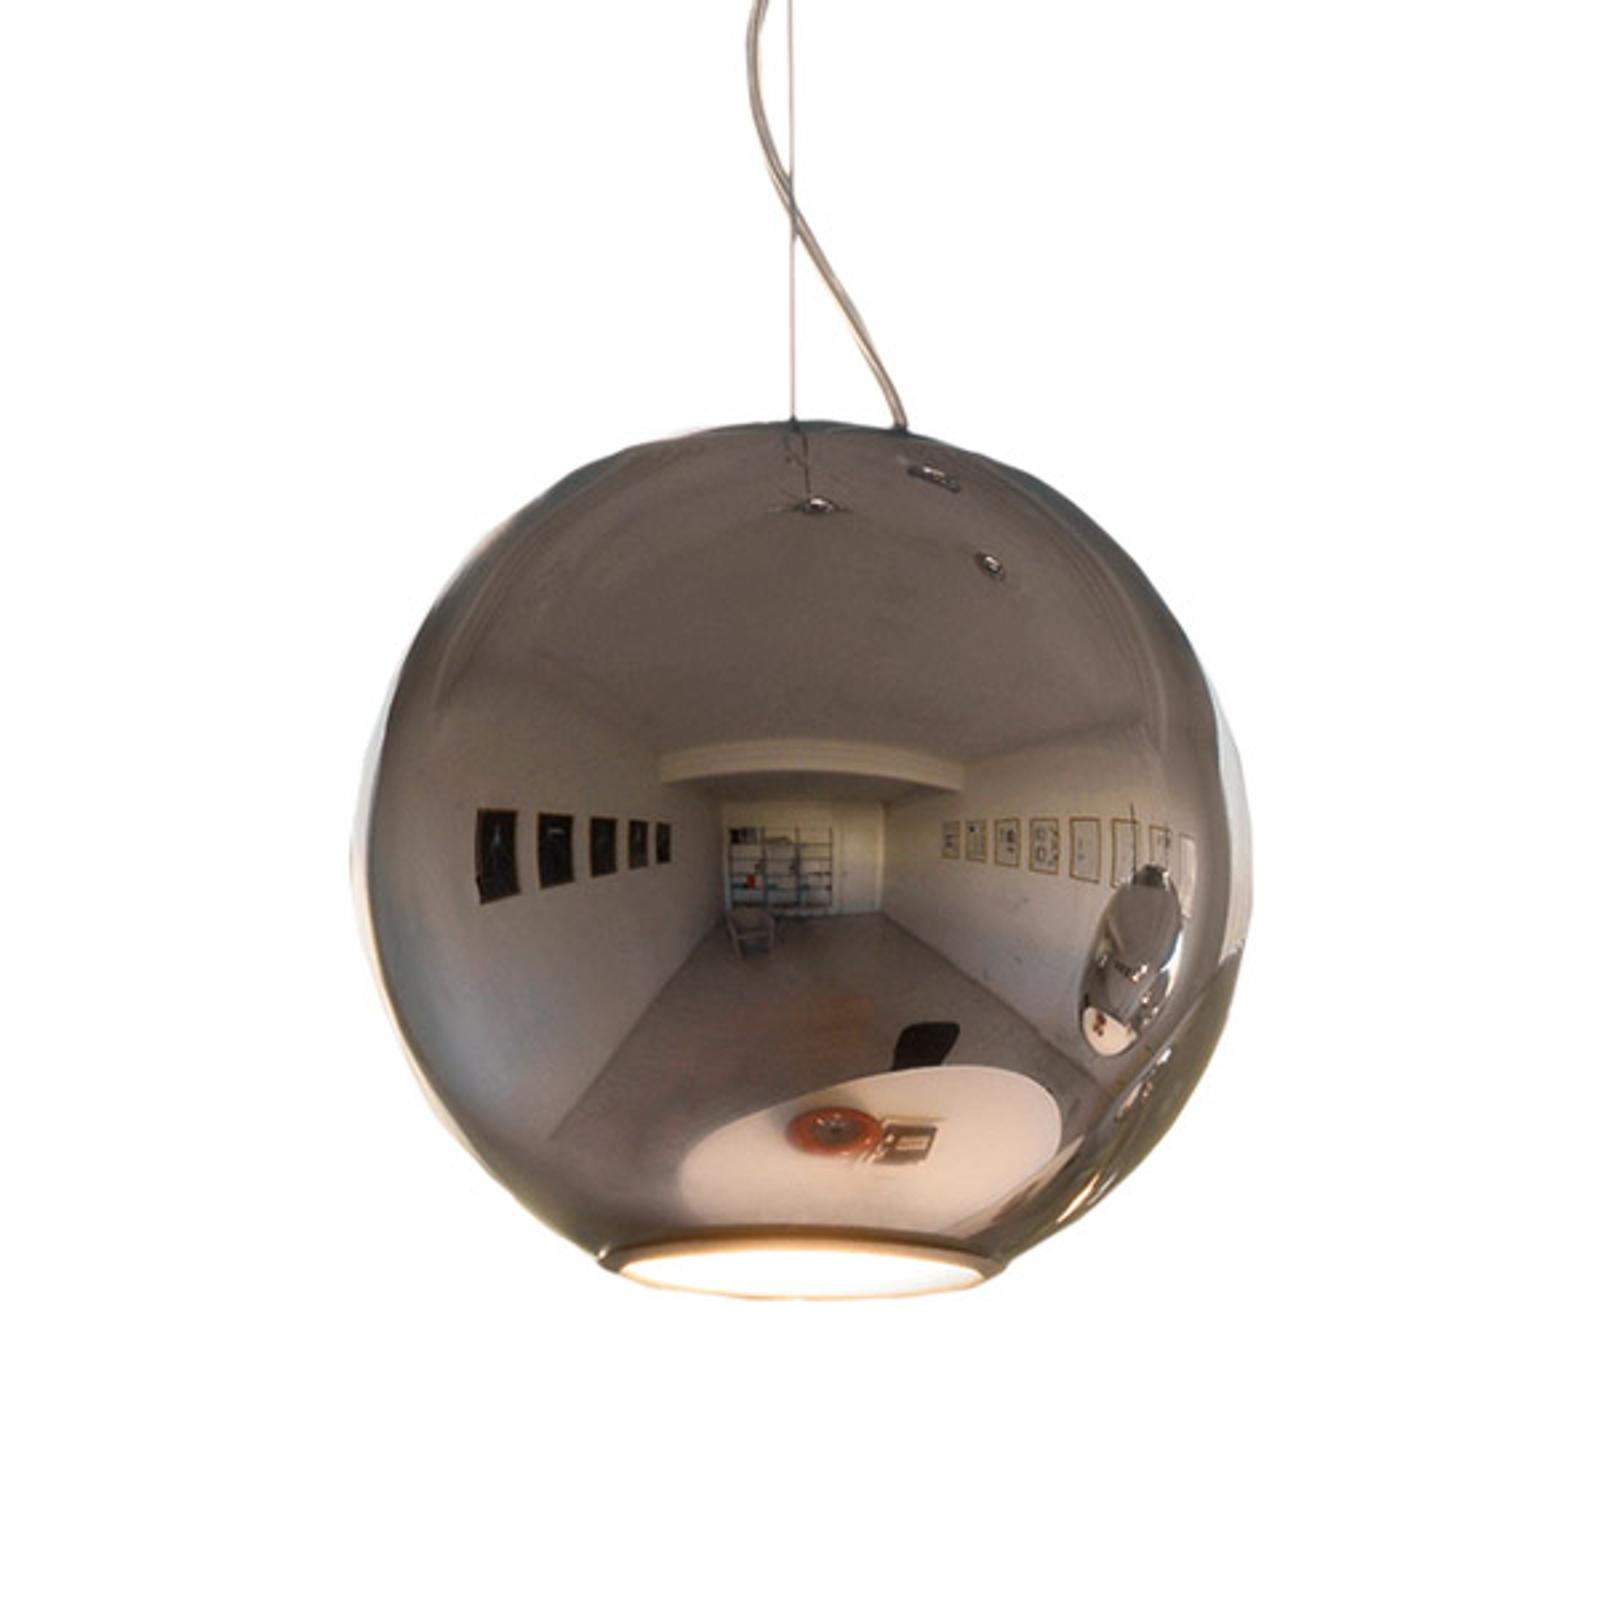 Designerska lampa wisząca GLOBO DI LUCE, śr. 20 cm